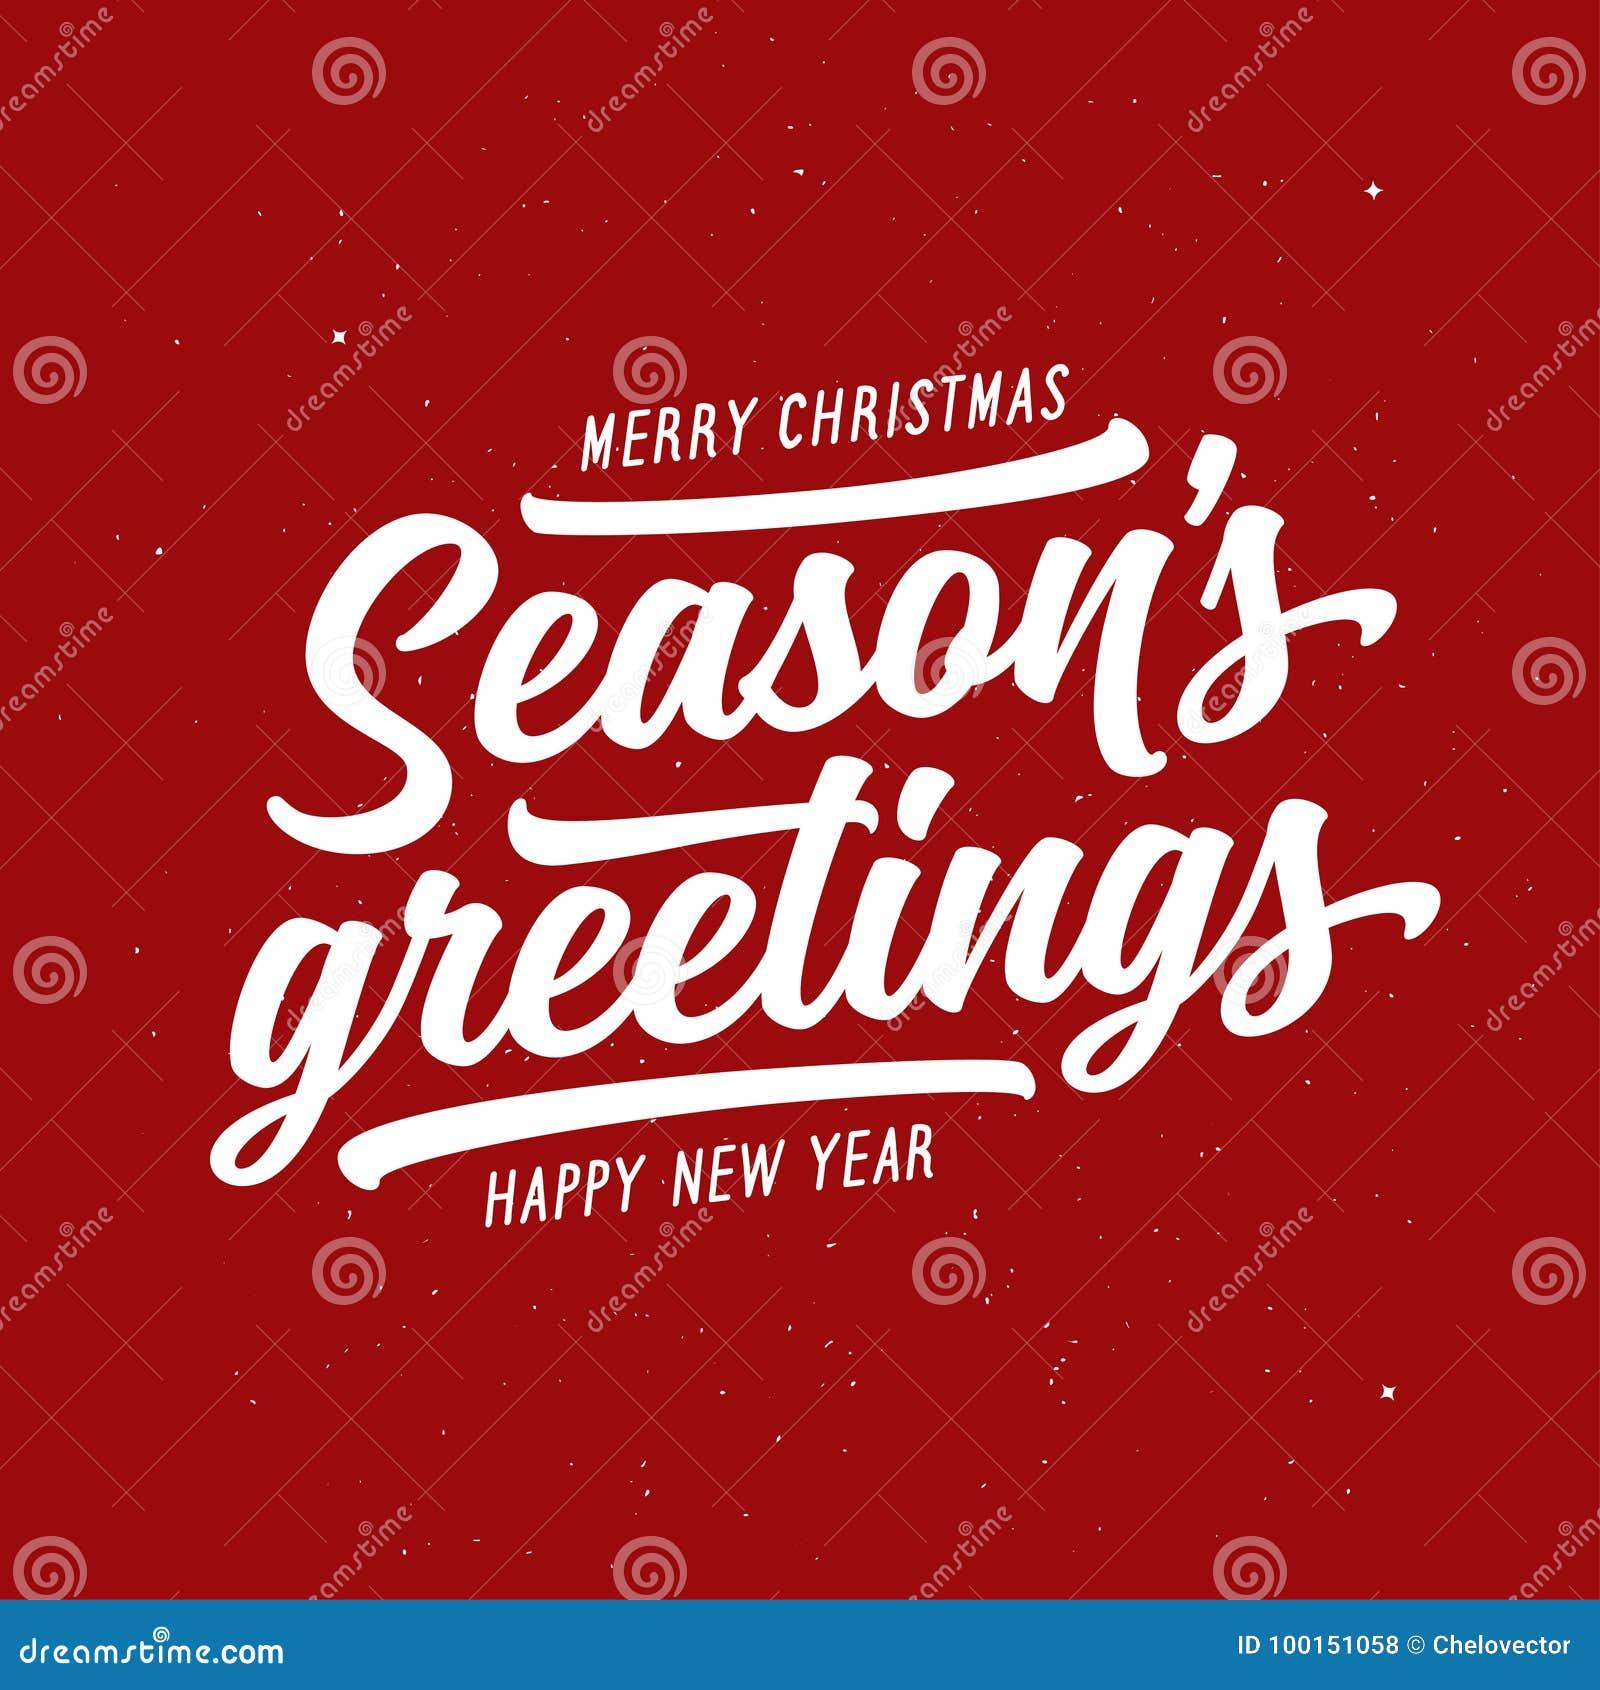 Season greetings typography composition vector vintage illustration download season greetings typography composition vector vintage illustration stock vector illustration of greetings m4hsunfo